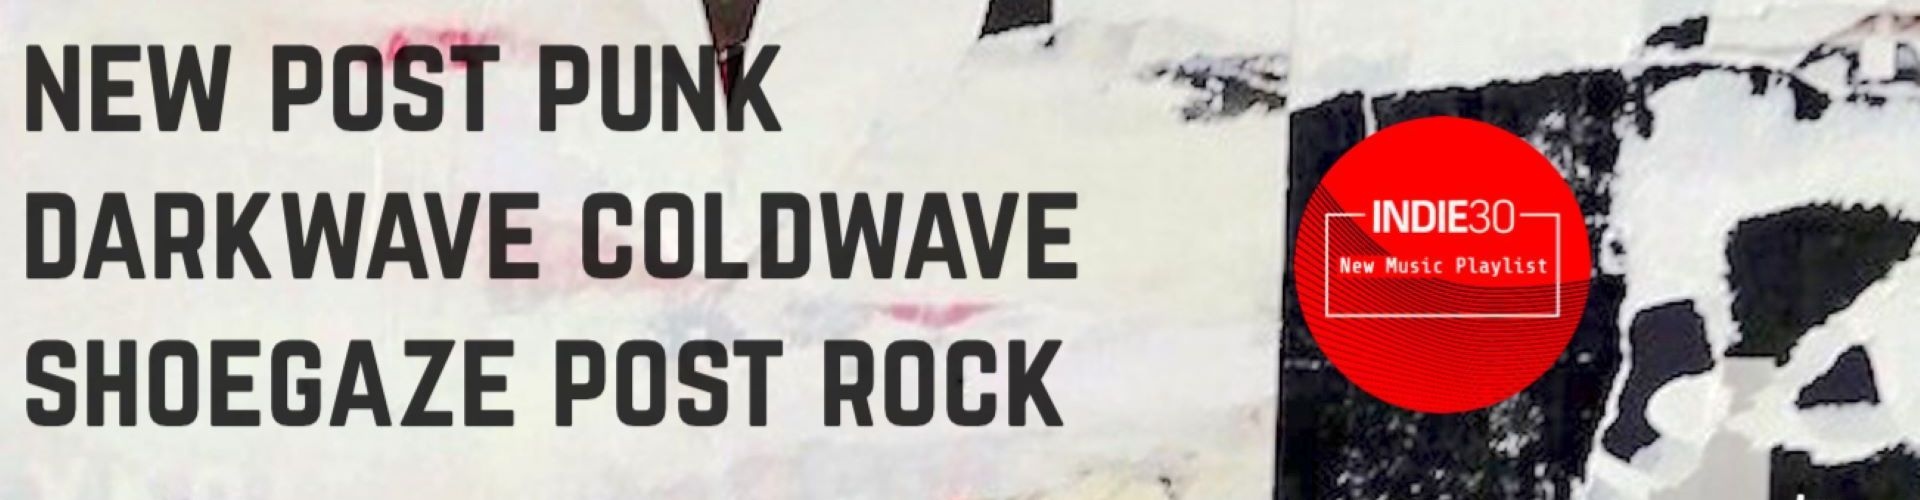 Post-Punk-DC-Wave-Shoegaze-Post-Rock-banner-1